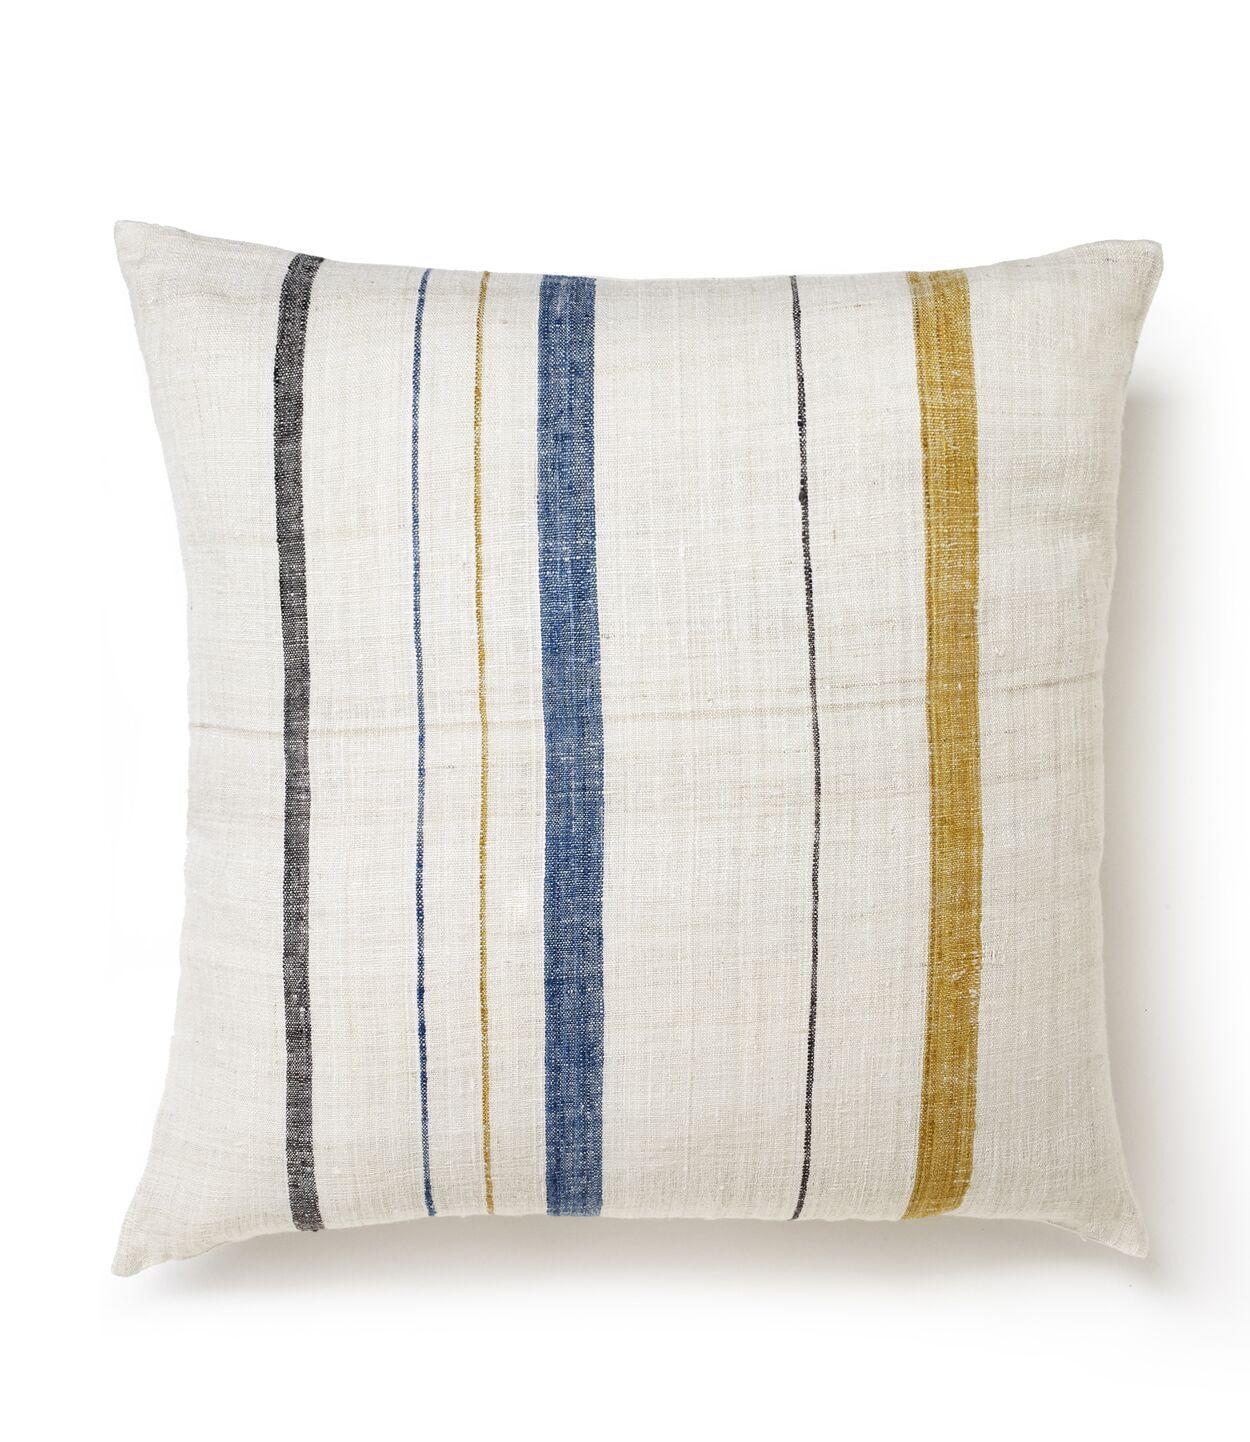 Halcyon Silk Throw Pillow